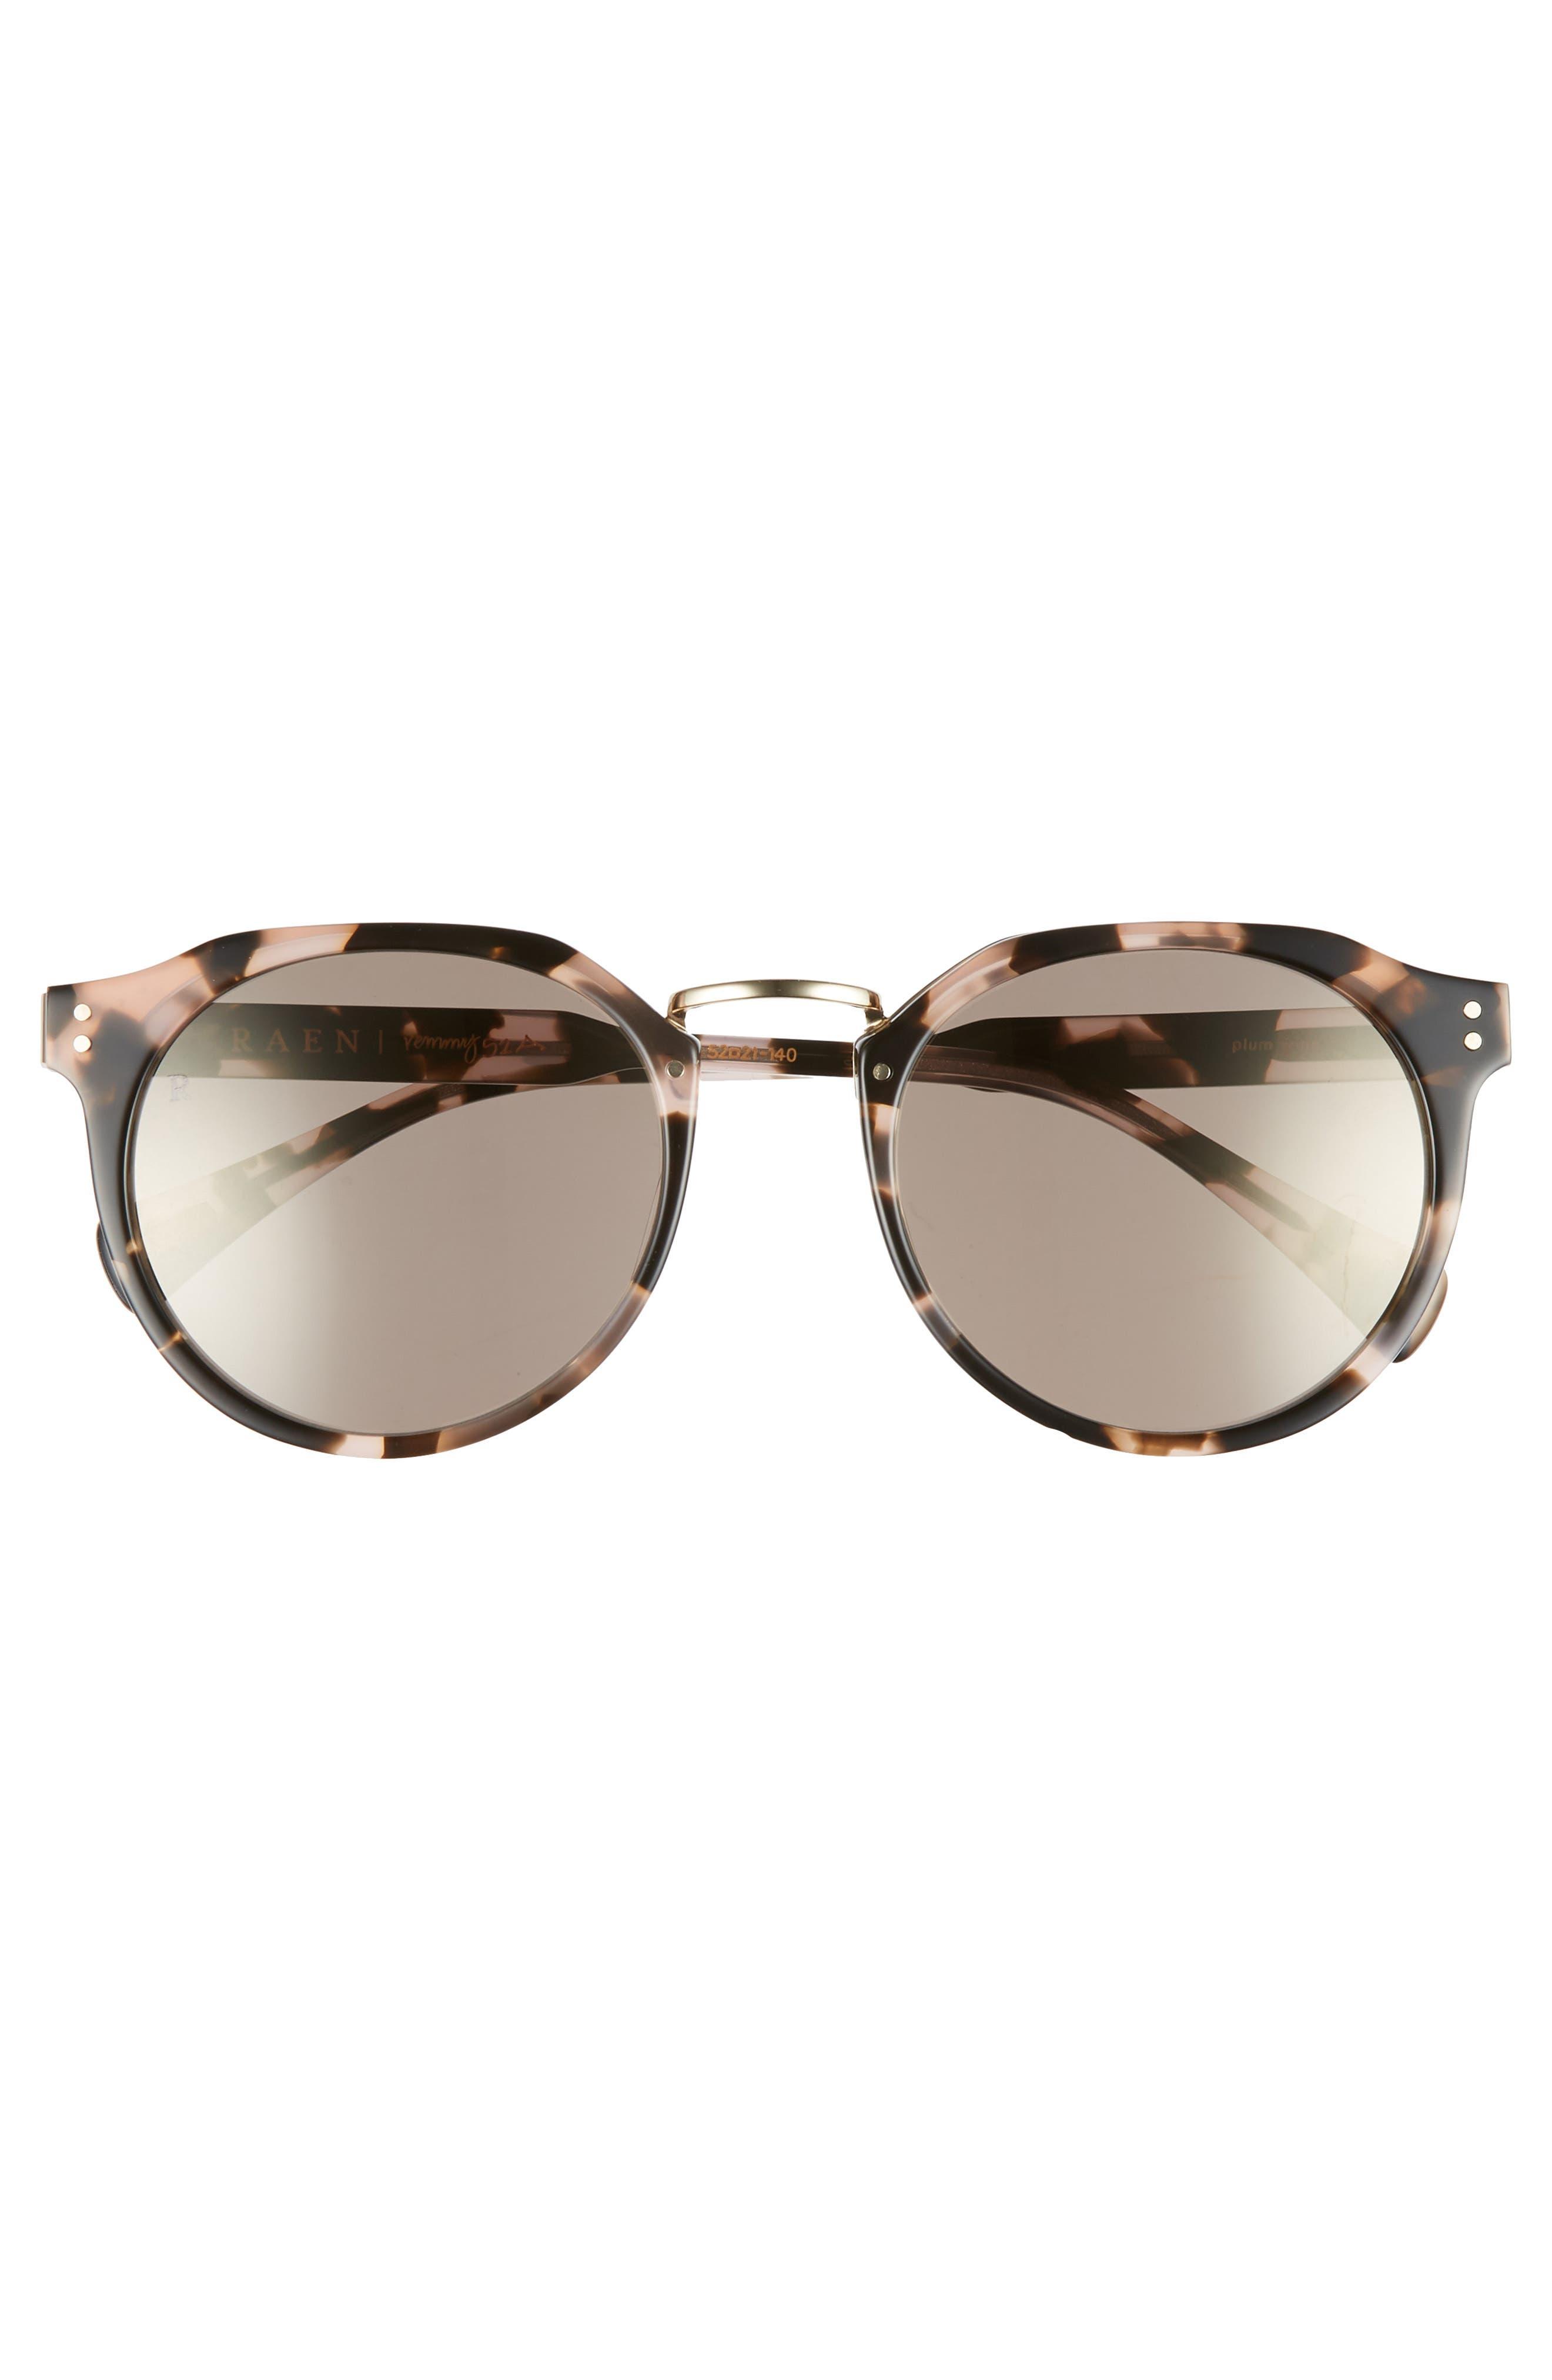 Remmy 52mm Sunglasses,                             Alternate thumbnail 2, color,                             PLUM WINE